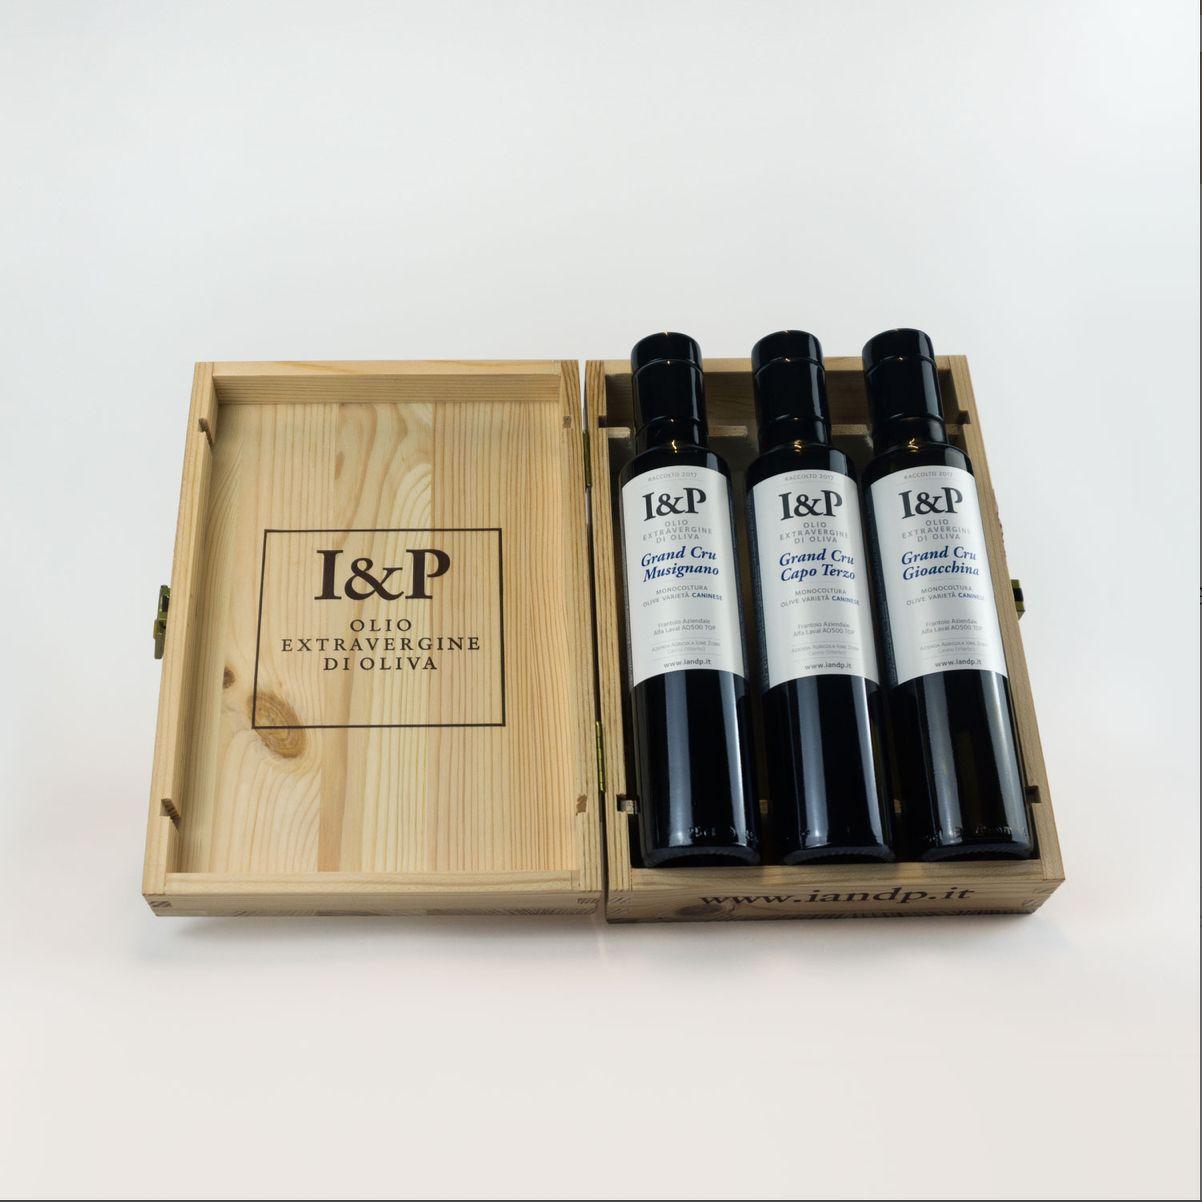 olive oil - THE EDGE SINGAPORE